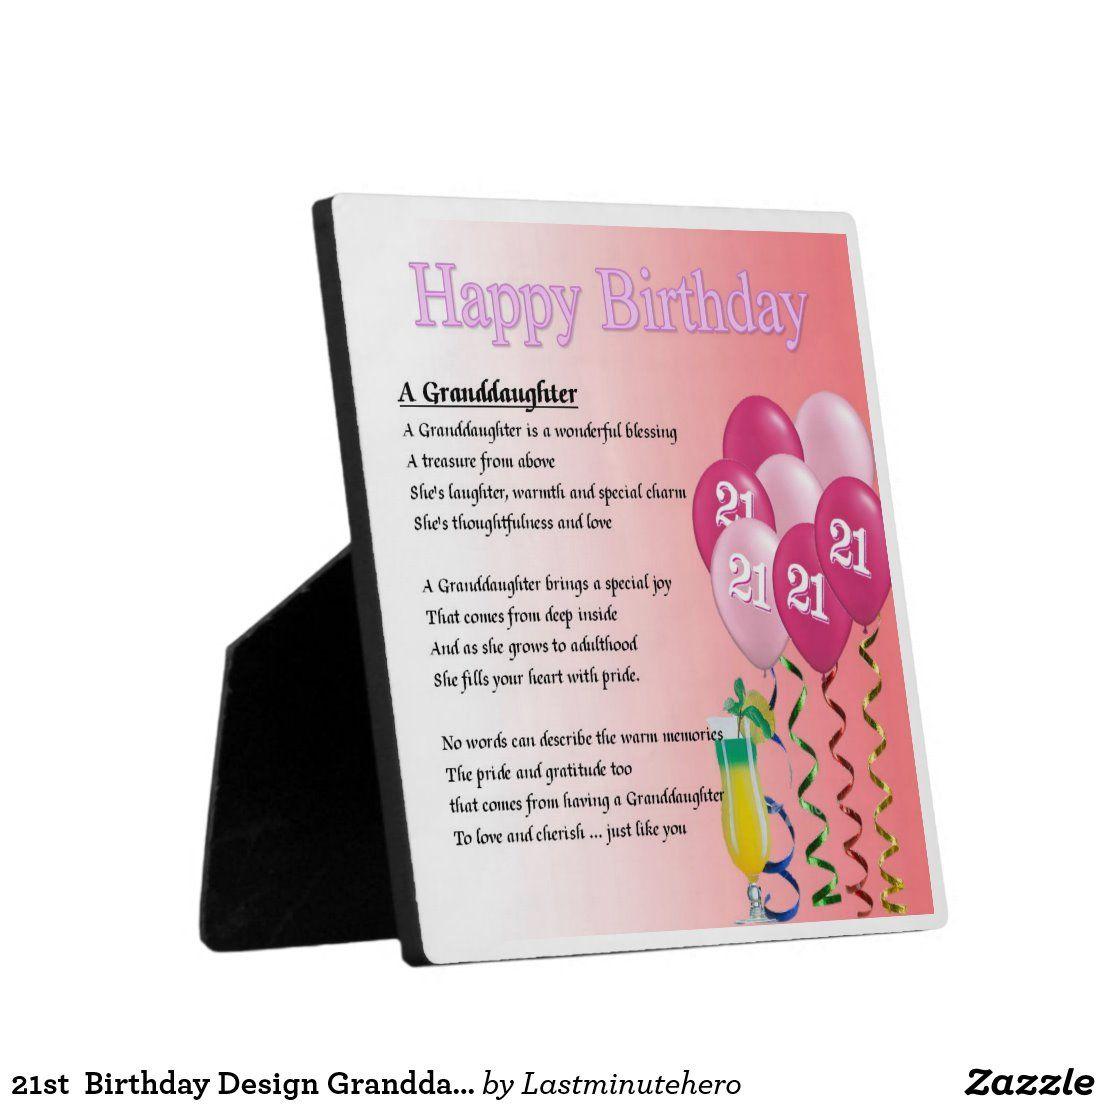 21st Birthday Design Granddaughter Poem Plaque Zazzle.co